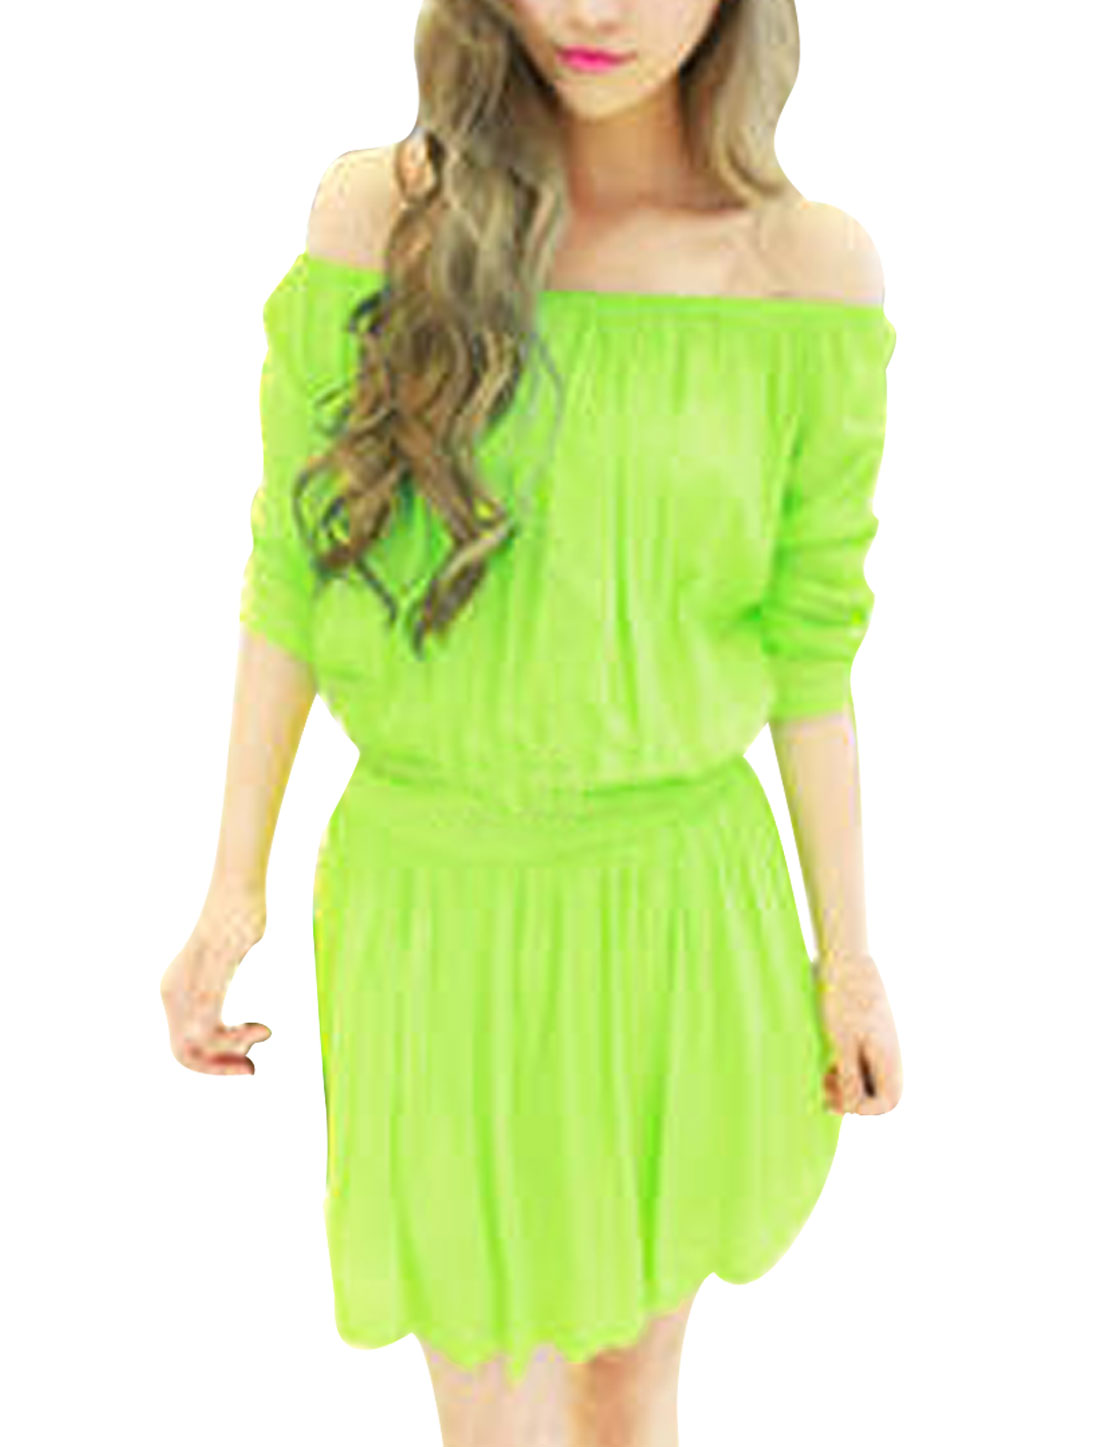 Woman Solid Color Apple Green Off-Shoulder Design Summer Mini Dress S